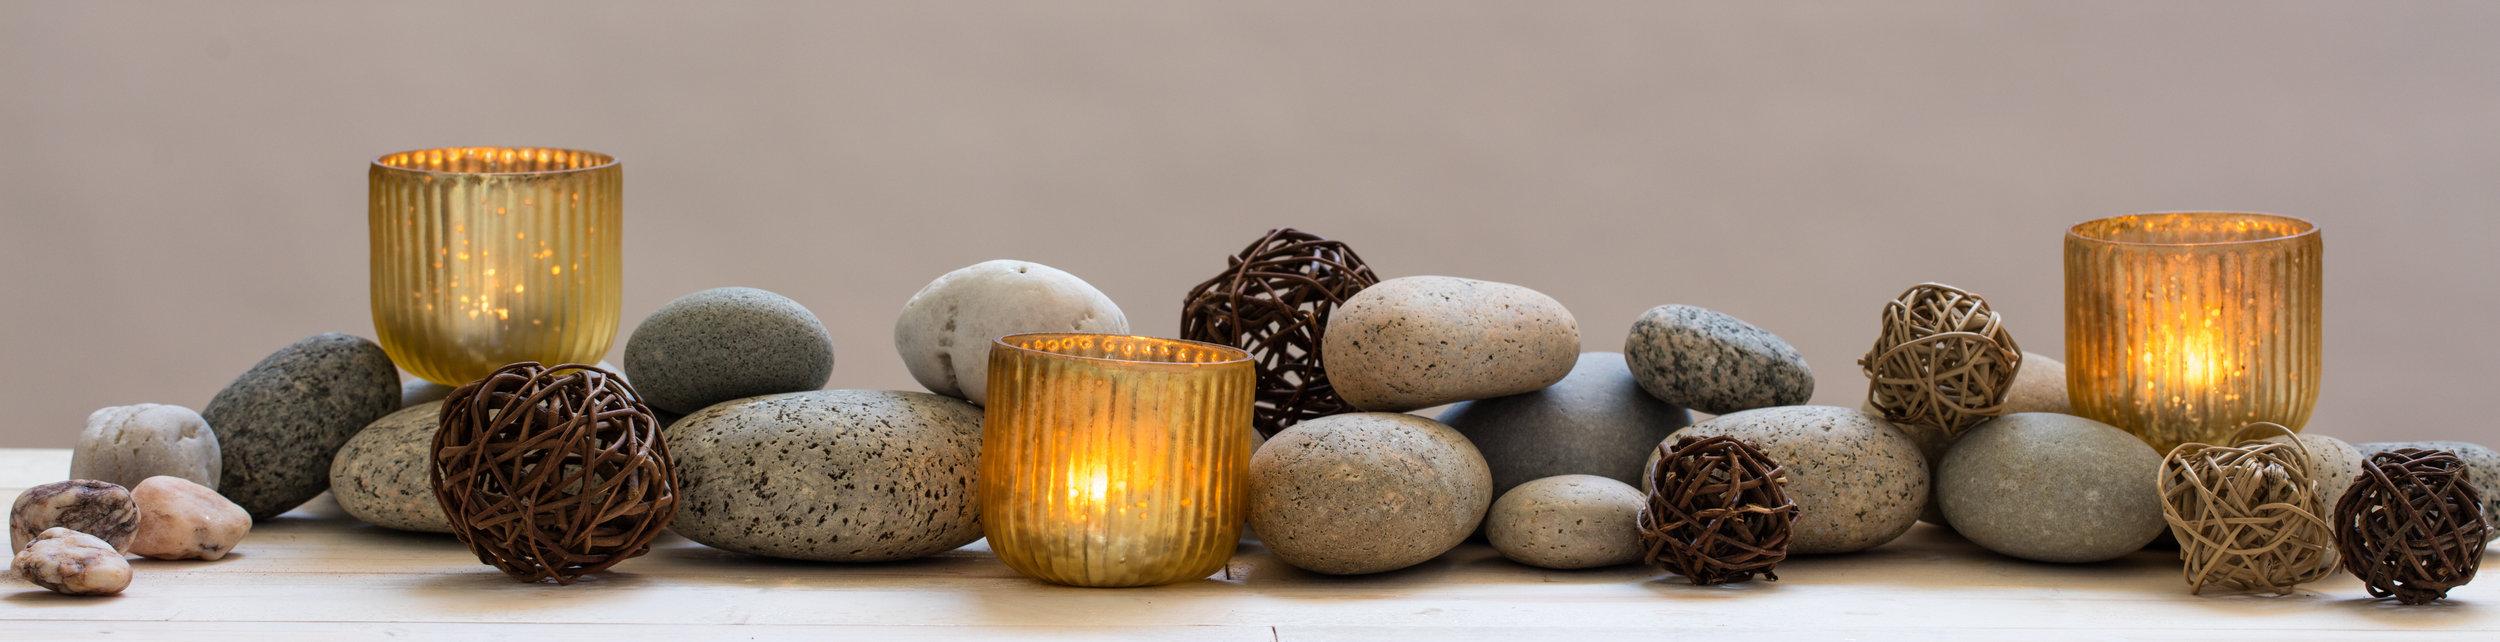 AdobeStock pd_170849253 - horiz stones and candles.jpeg